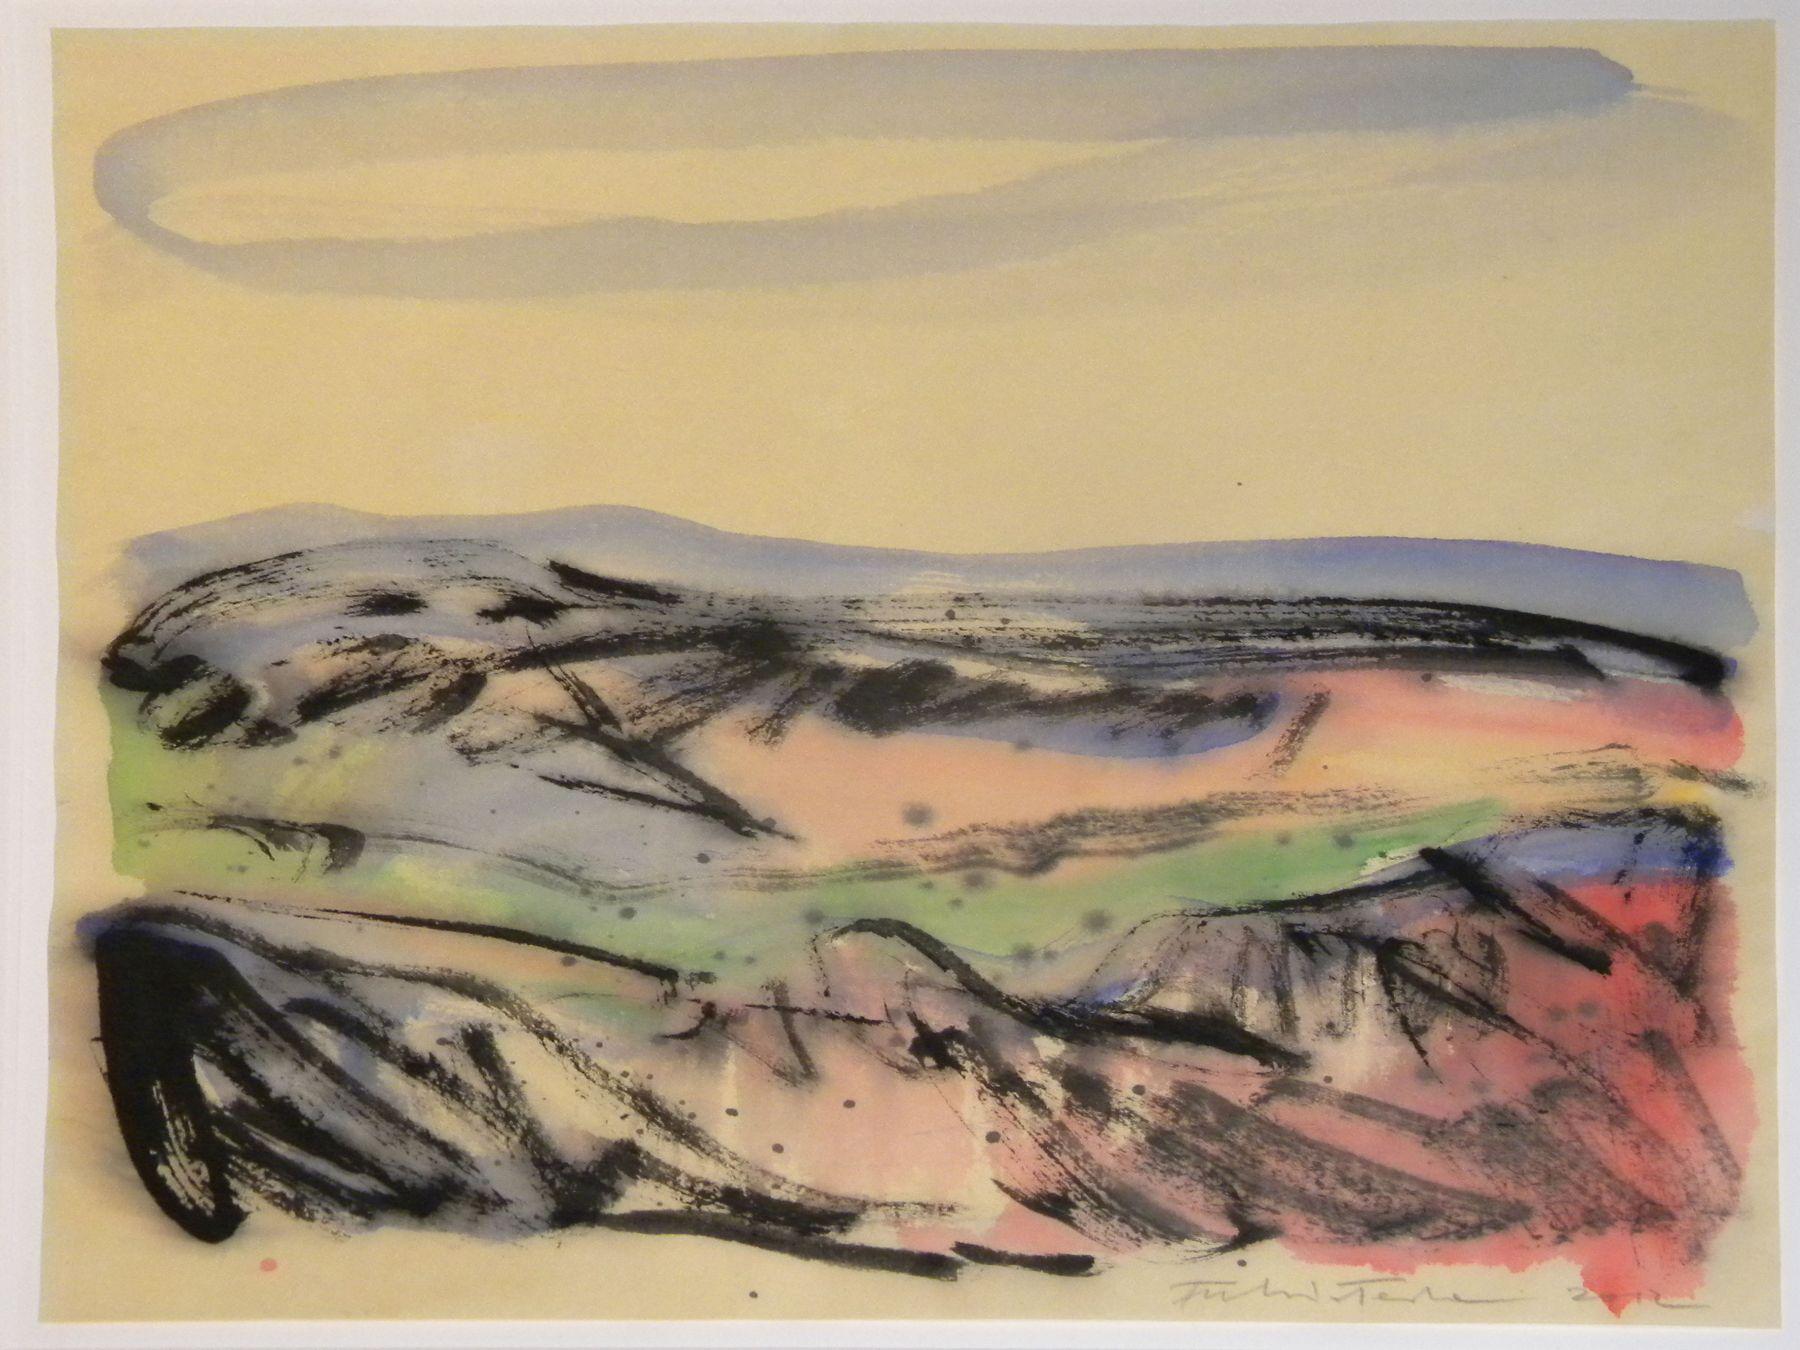 Fulvio Testa, Untitled 14, 2012    Watercolor on paper 13 1/4 x 15 1/8 inches